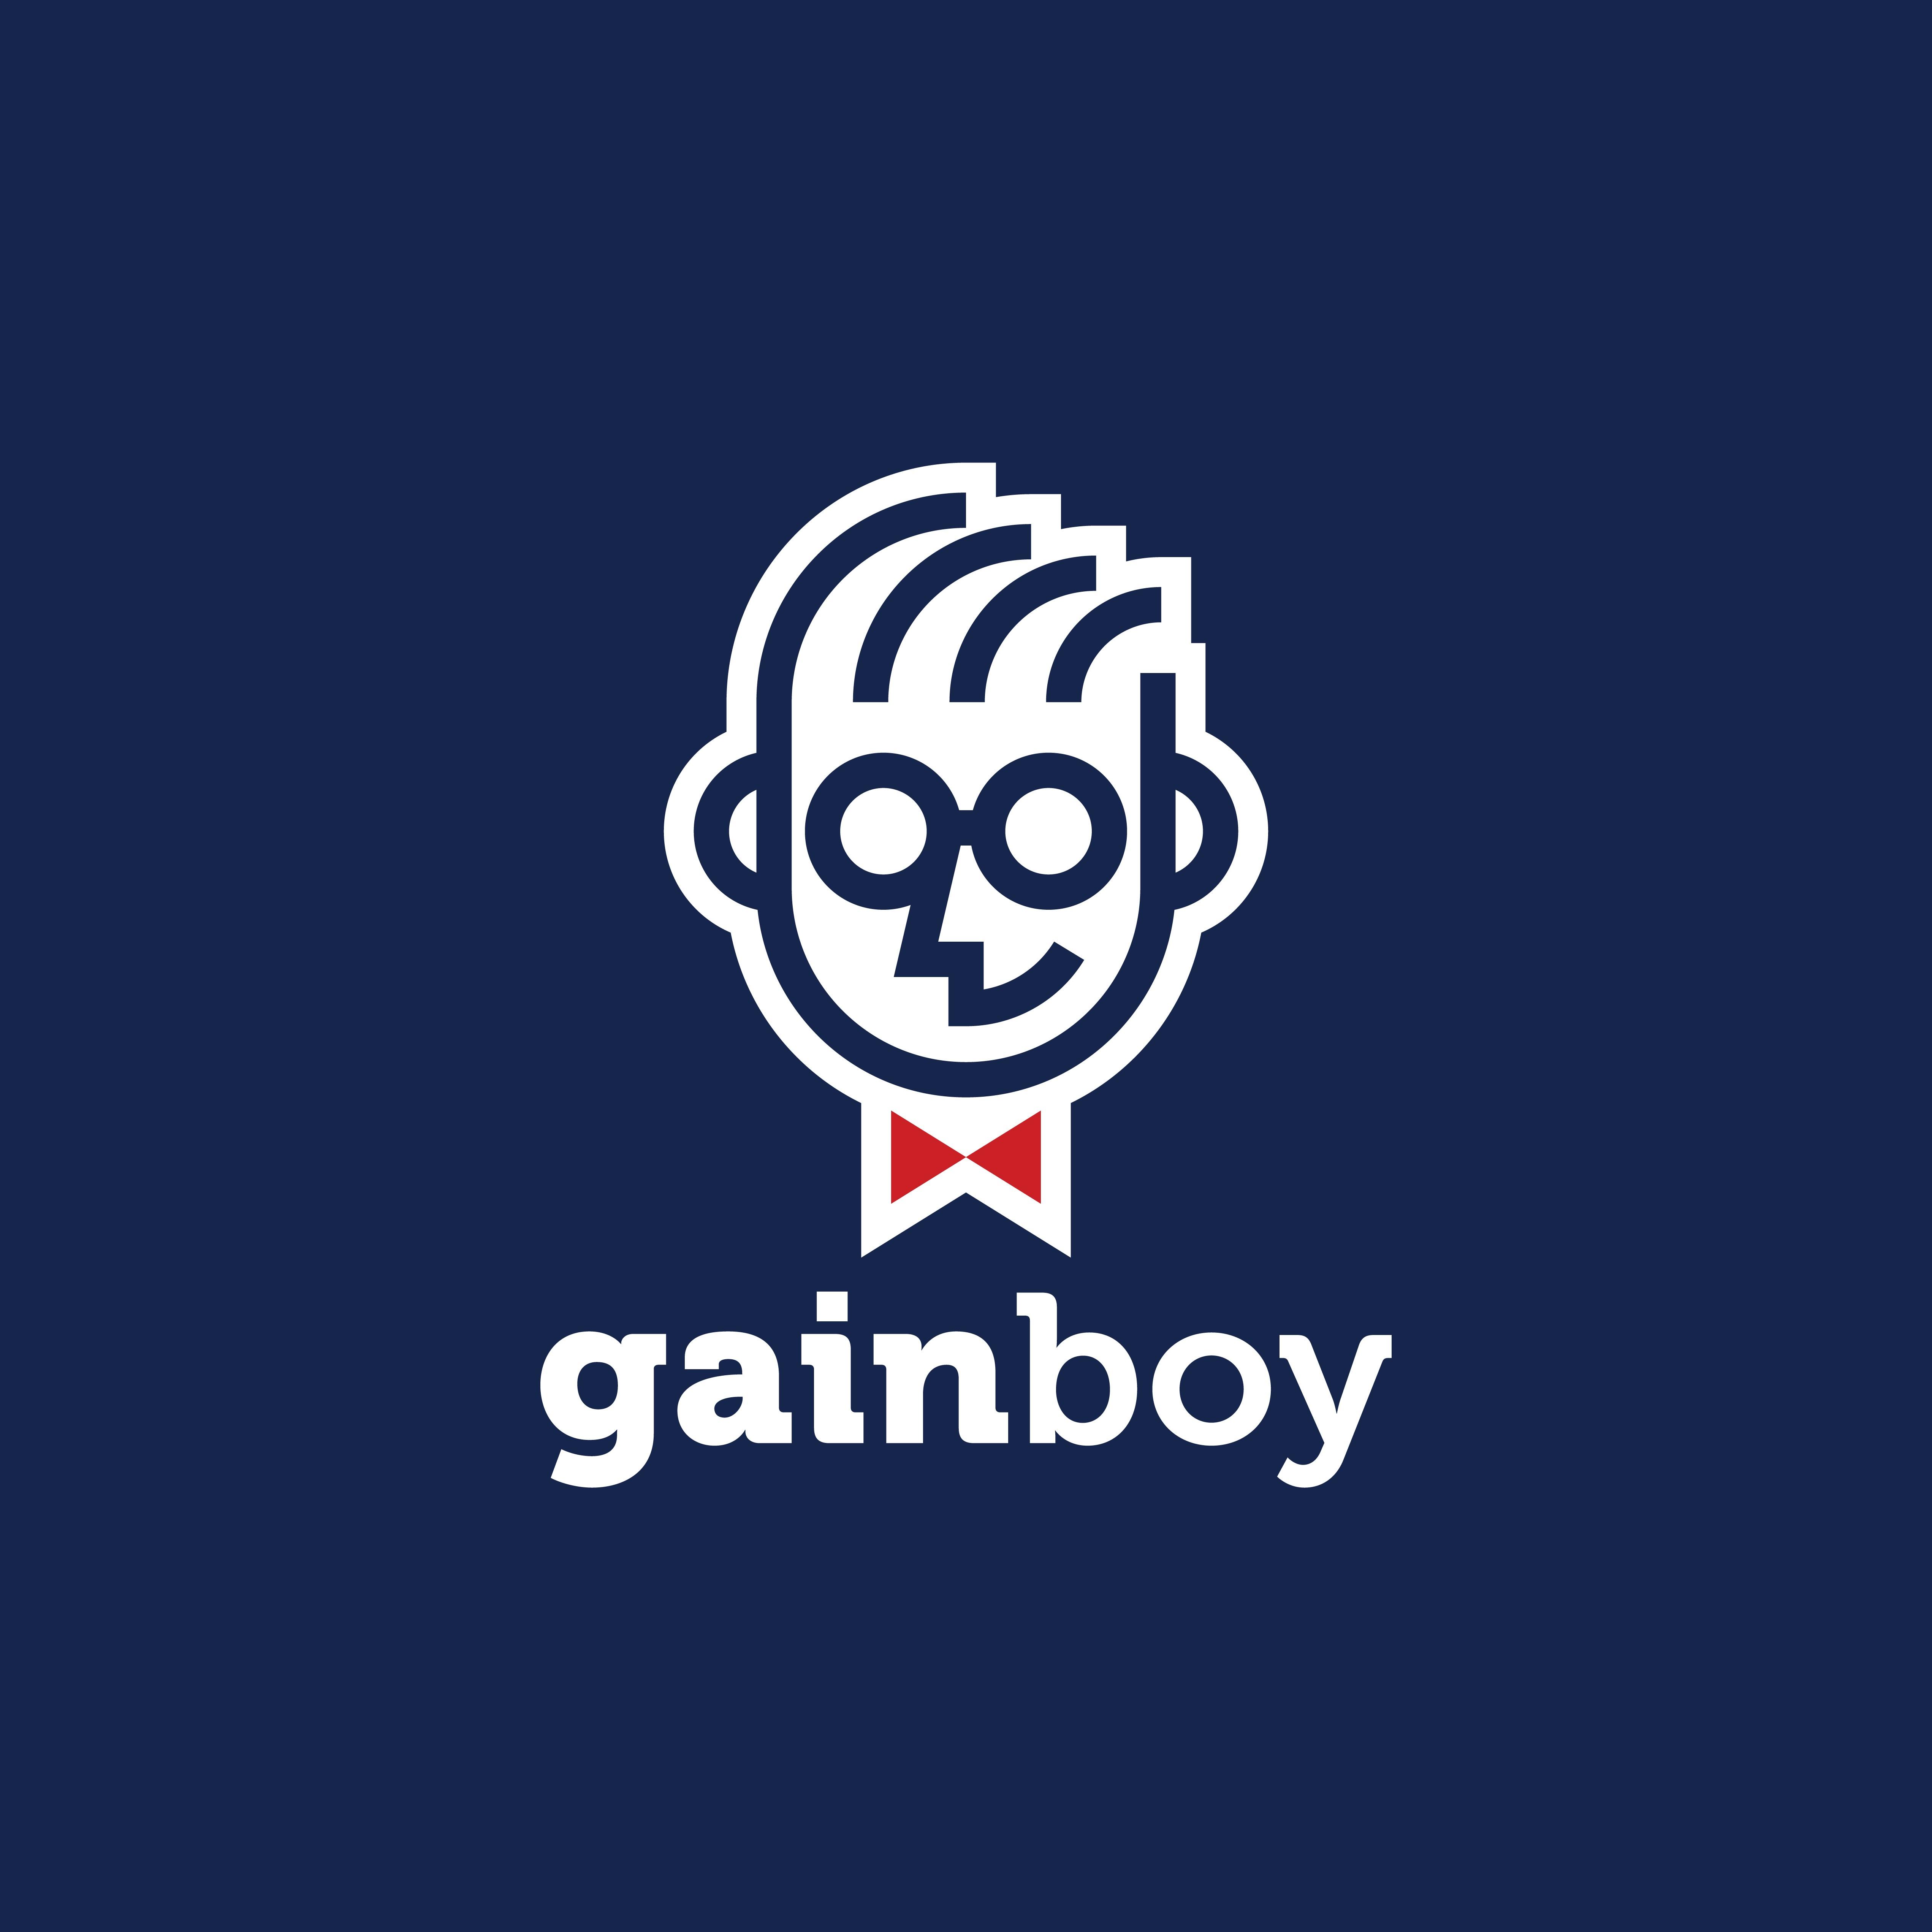 Create a Playful, Mascot-like Logo for Gainboy